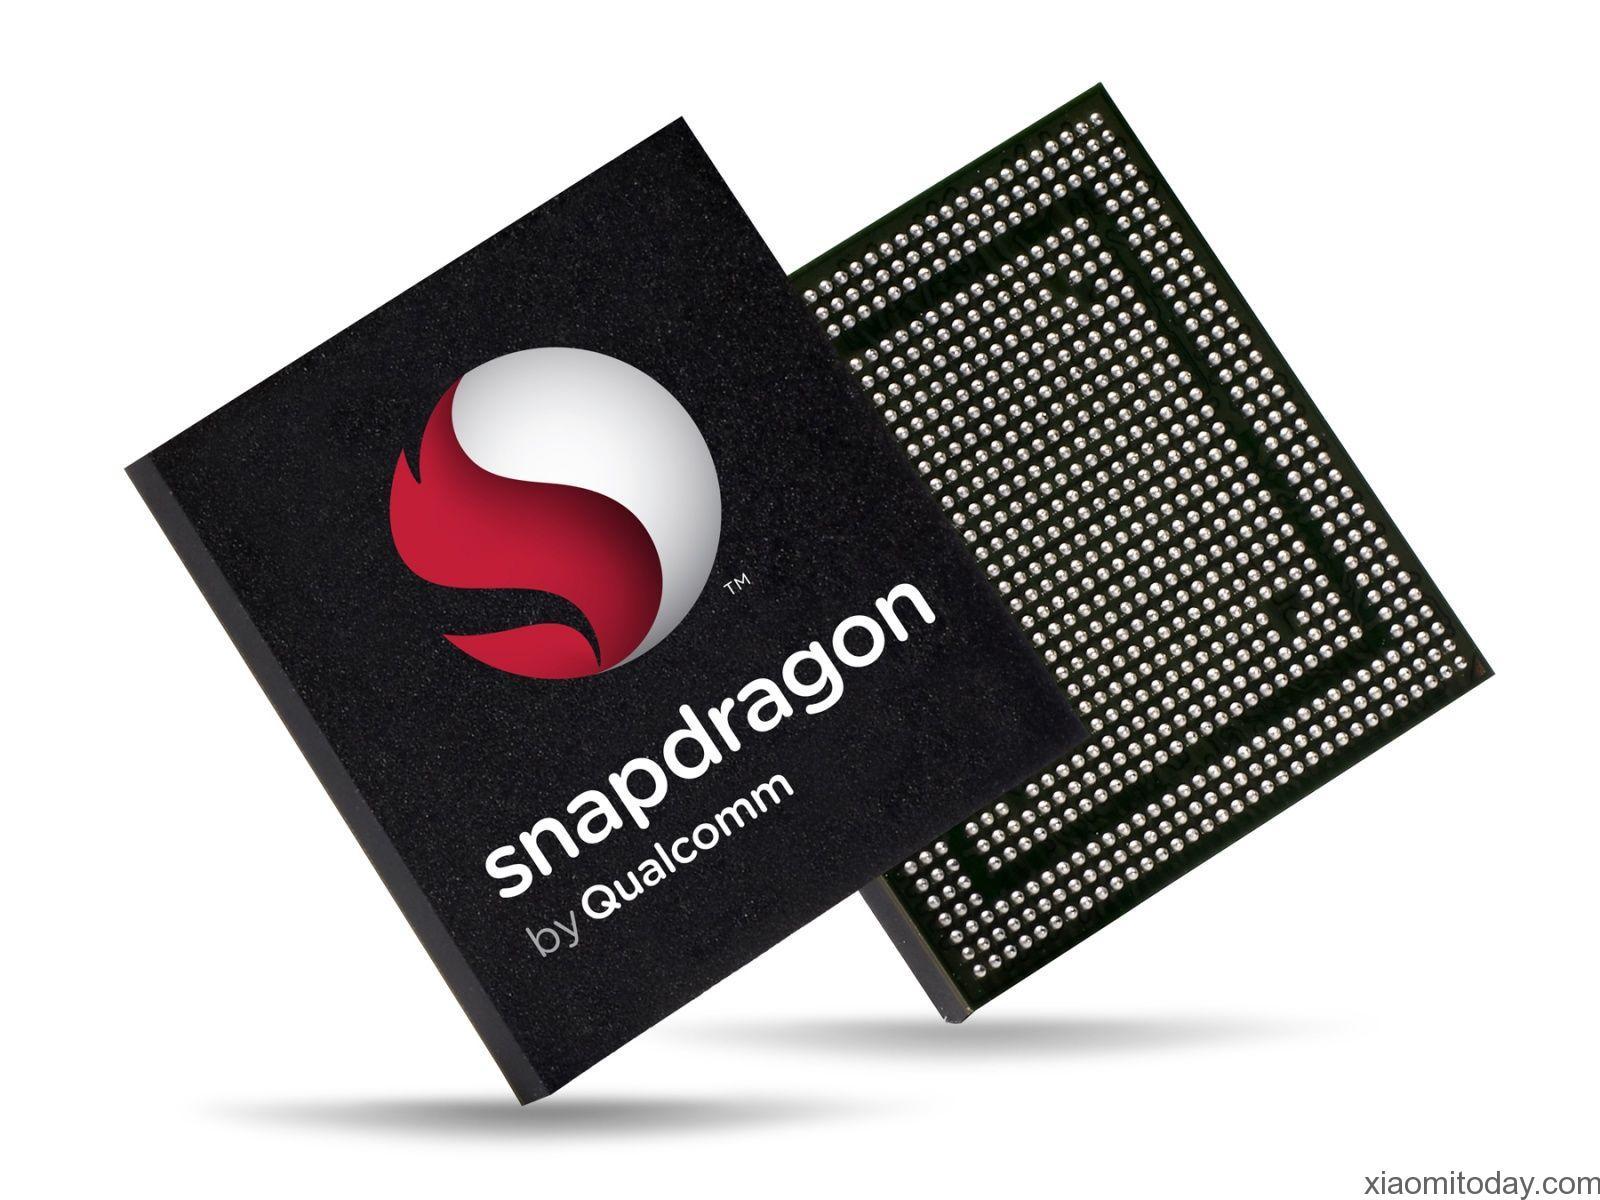 Qualcomm-Snapdragon 810